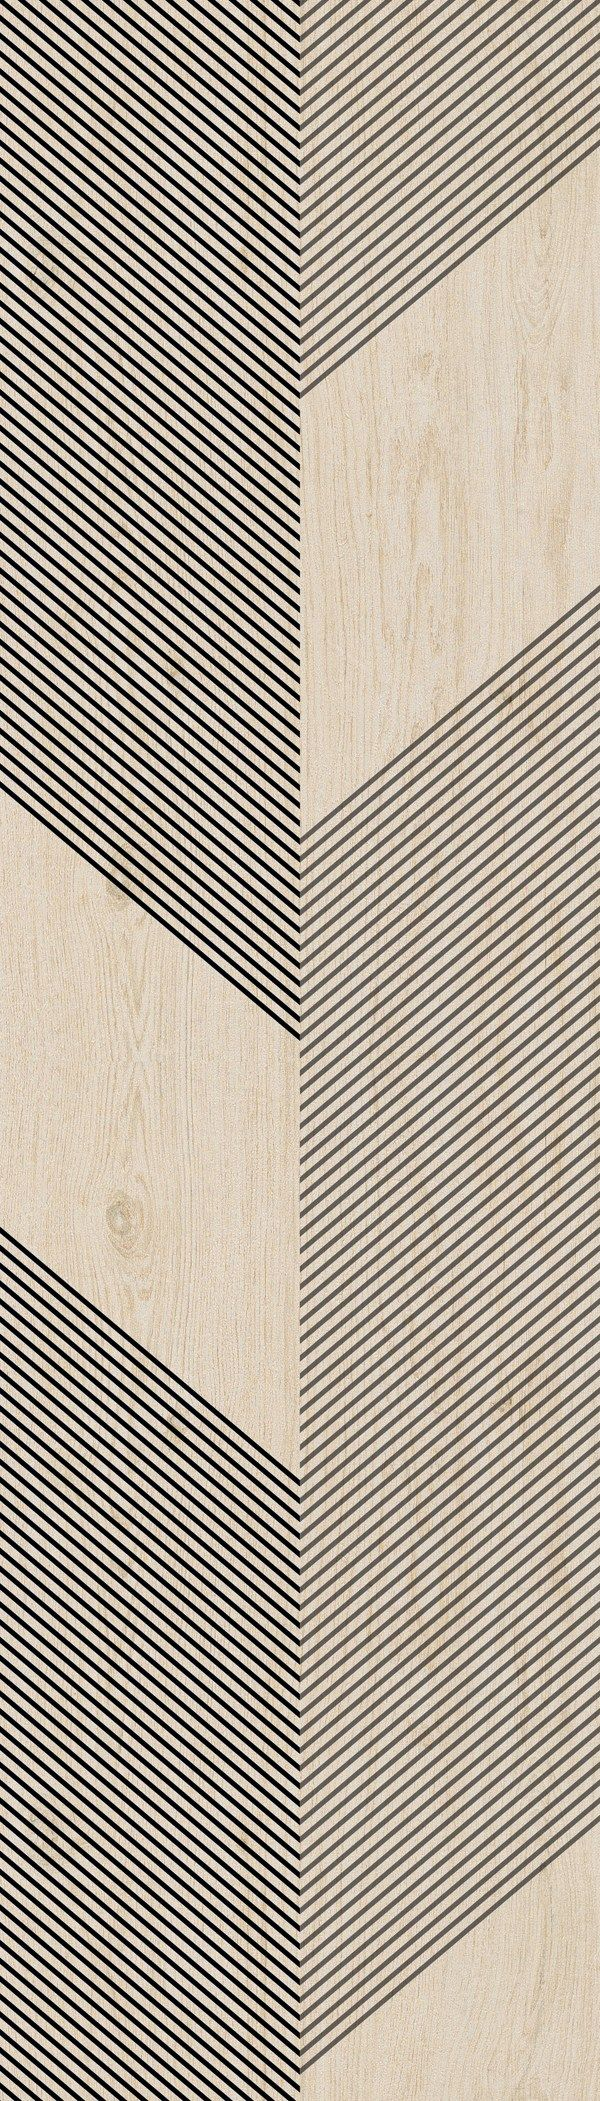 floor tiles type 32 slimtech slimtech collection by lea. Black Bedroom Furniture Sets. Home Design Ideas